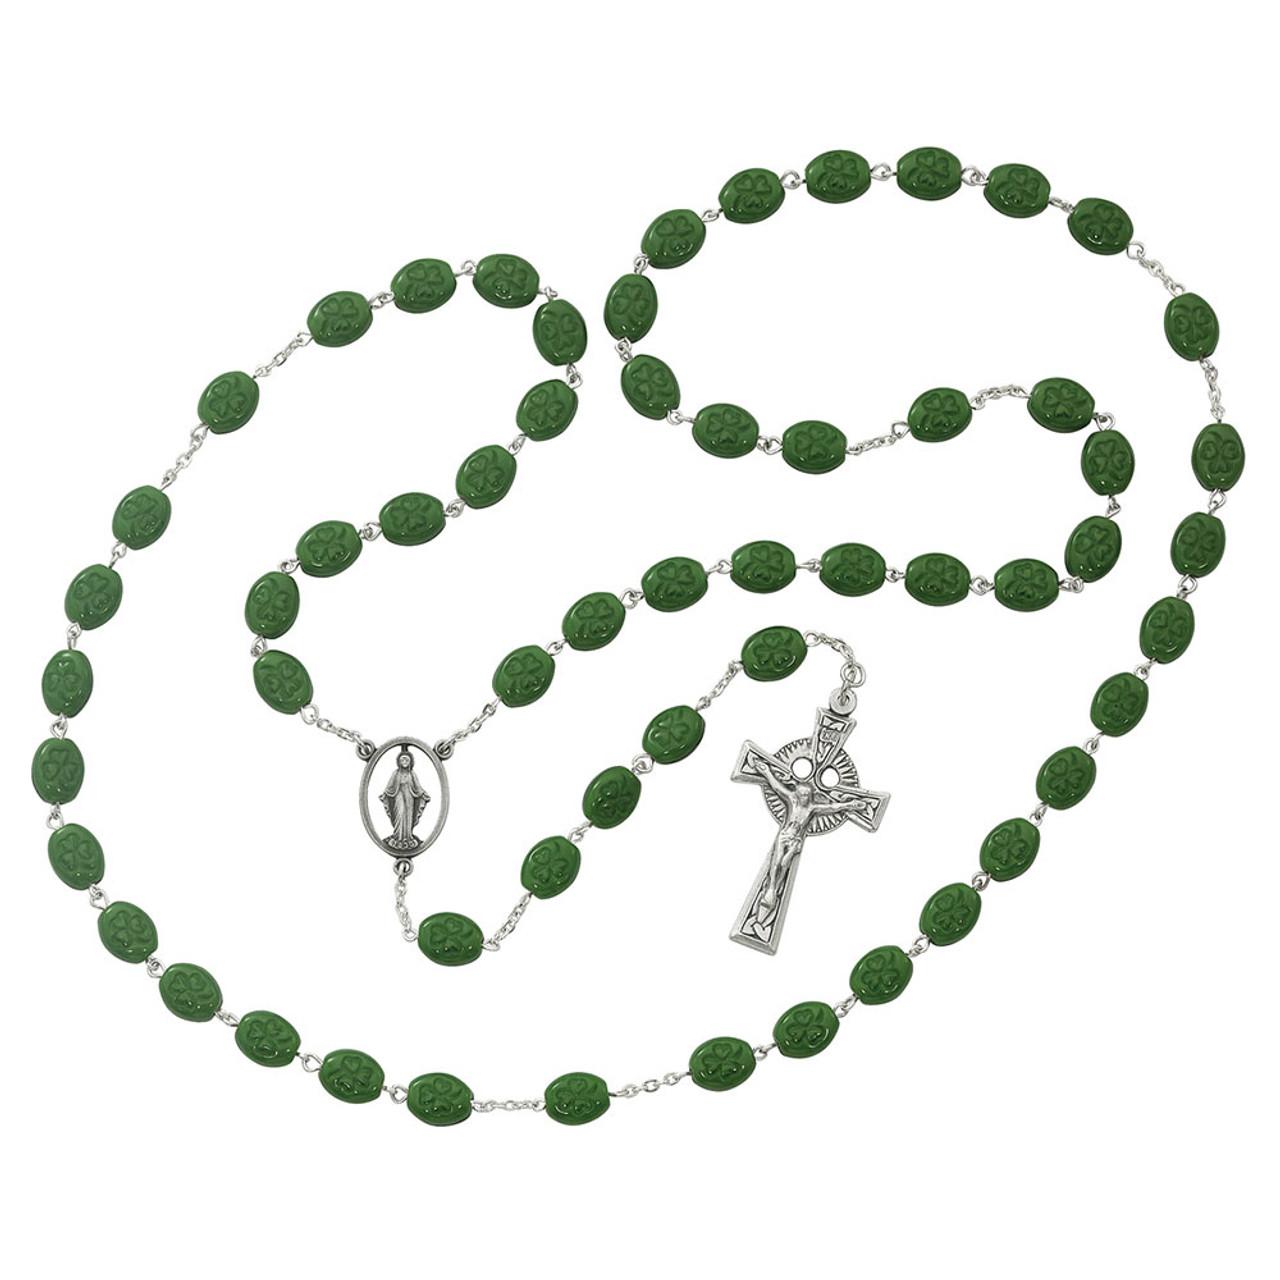 Shamrock Rosary Beads